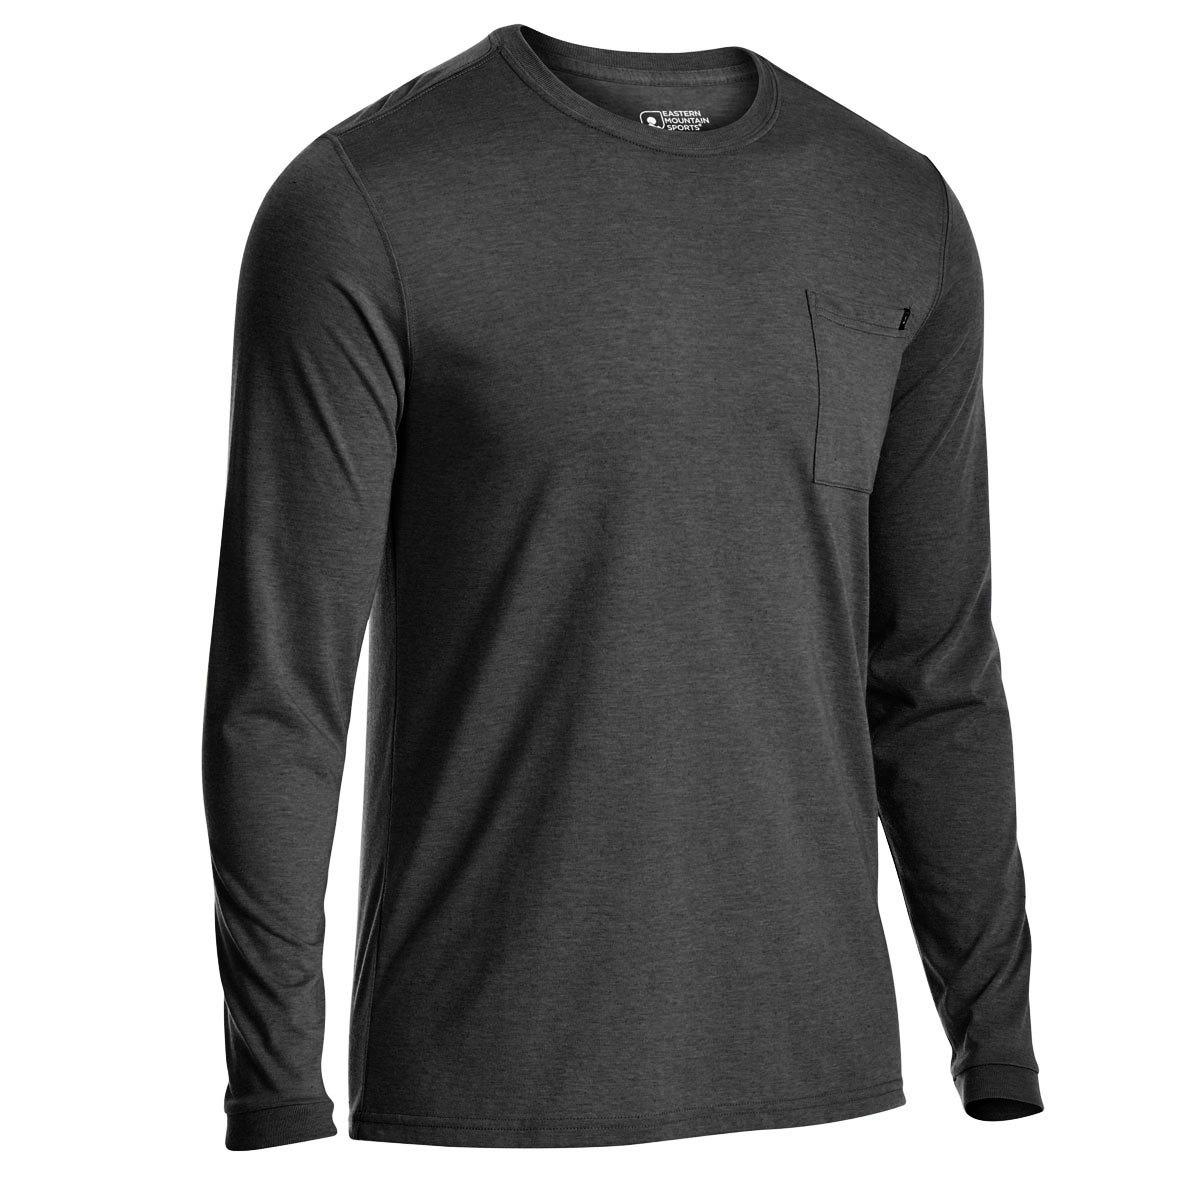 Ems Men's Techwick Vital Pocket Long-Sleeve Tee - Black, M